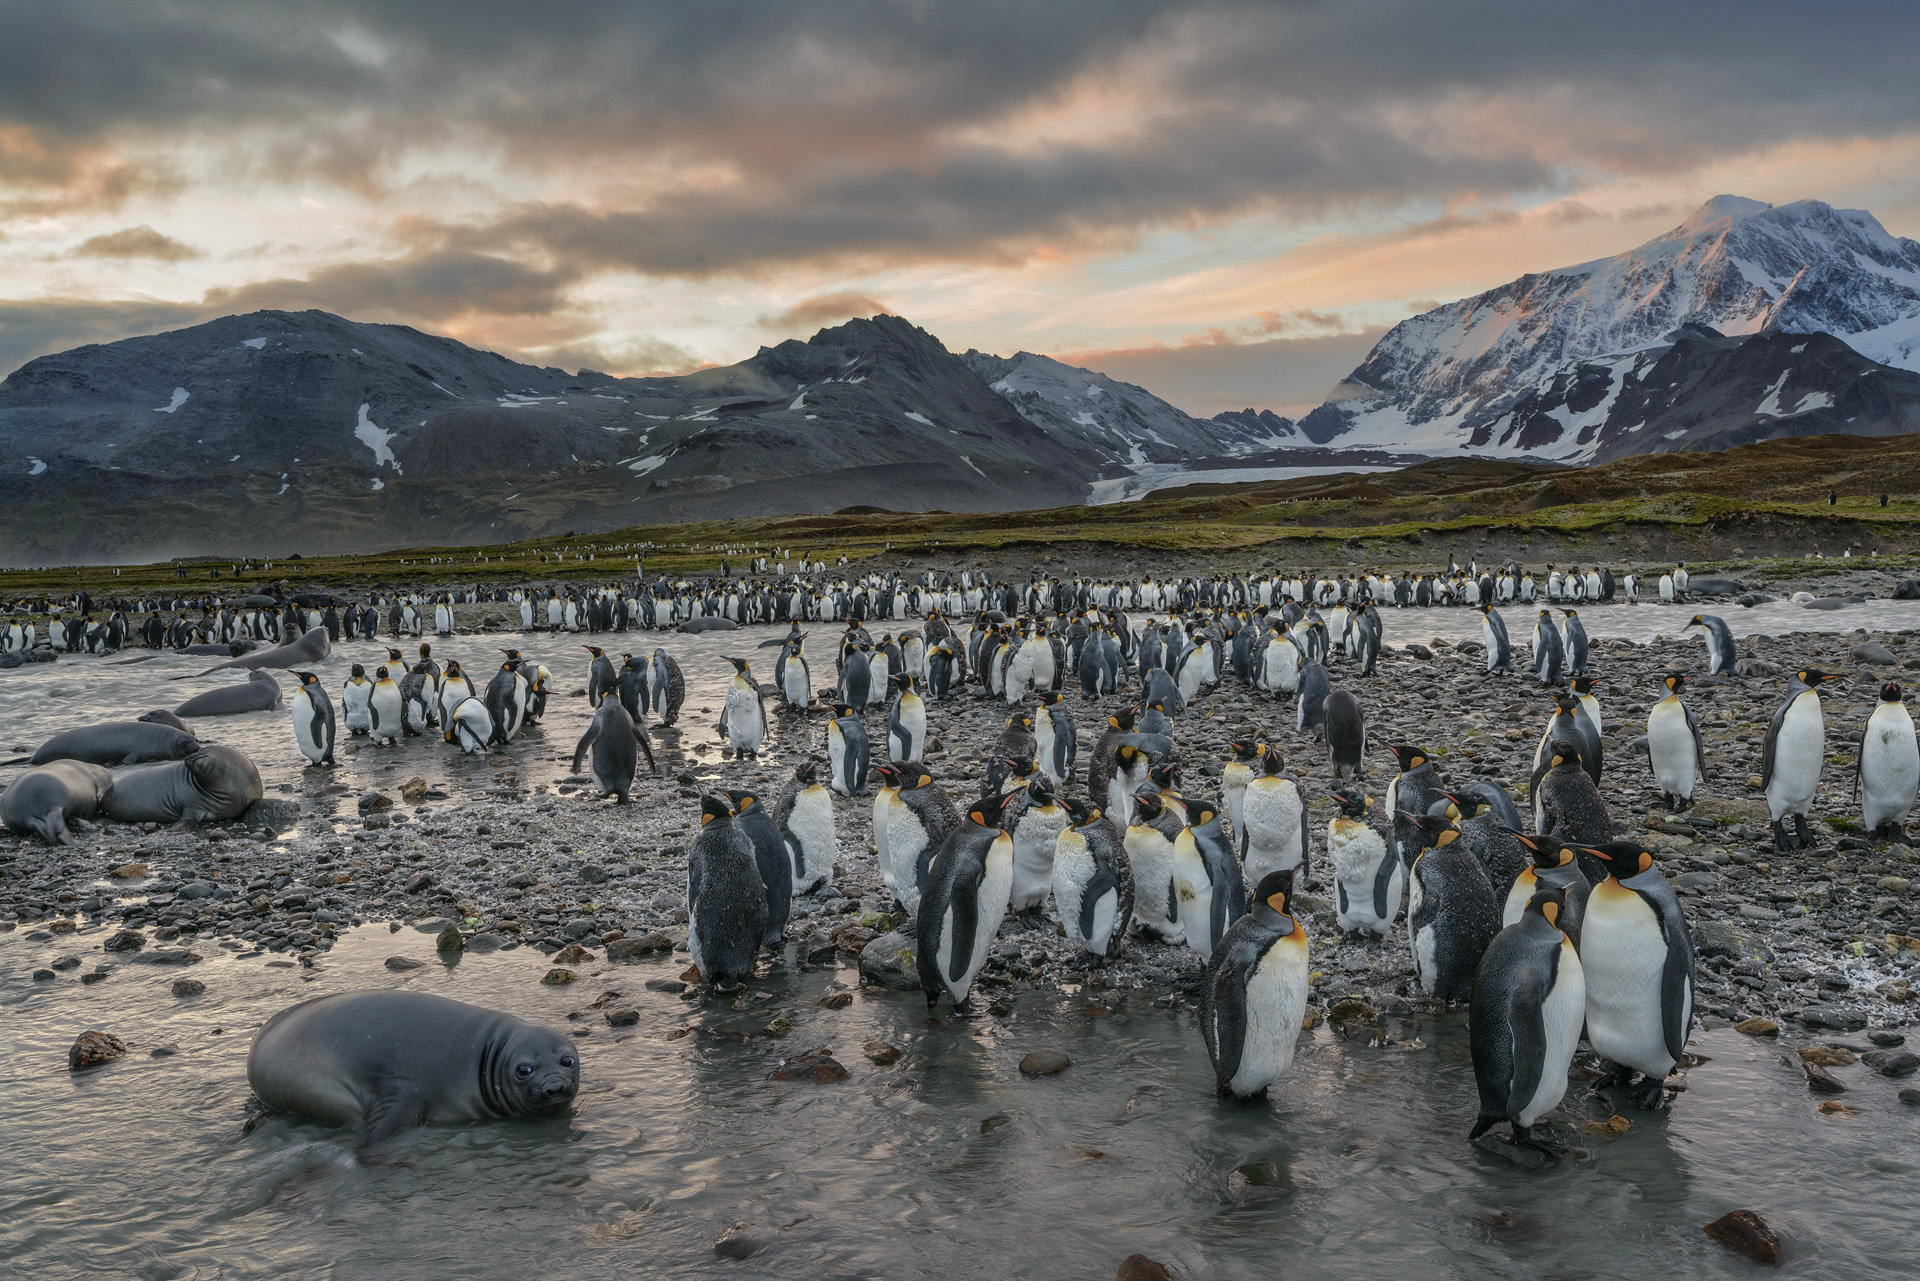 King Penguins, St. Andrews Bay, South Georgia, Antarctica 2016